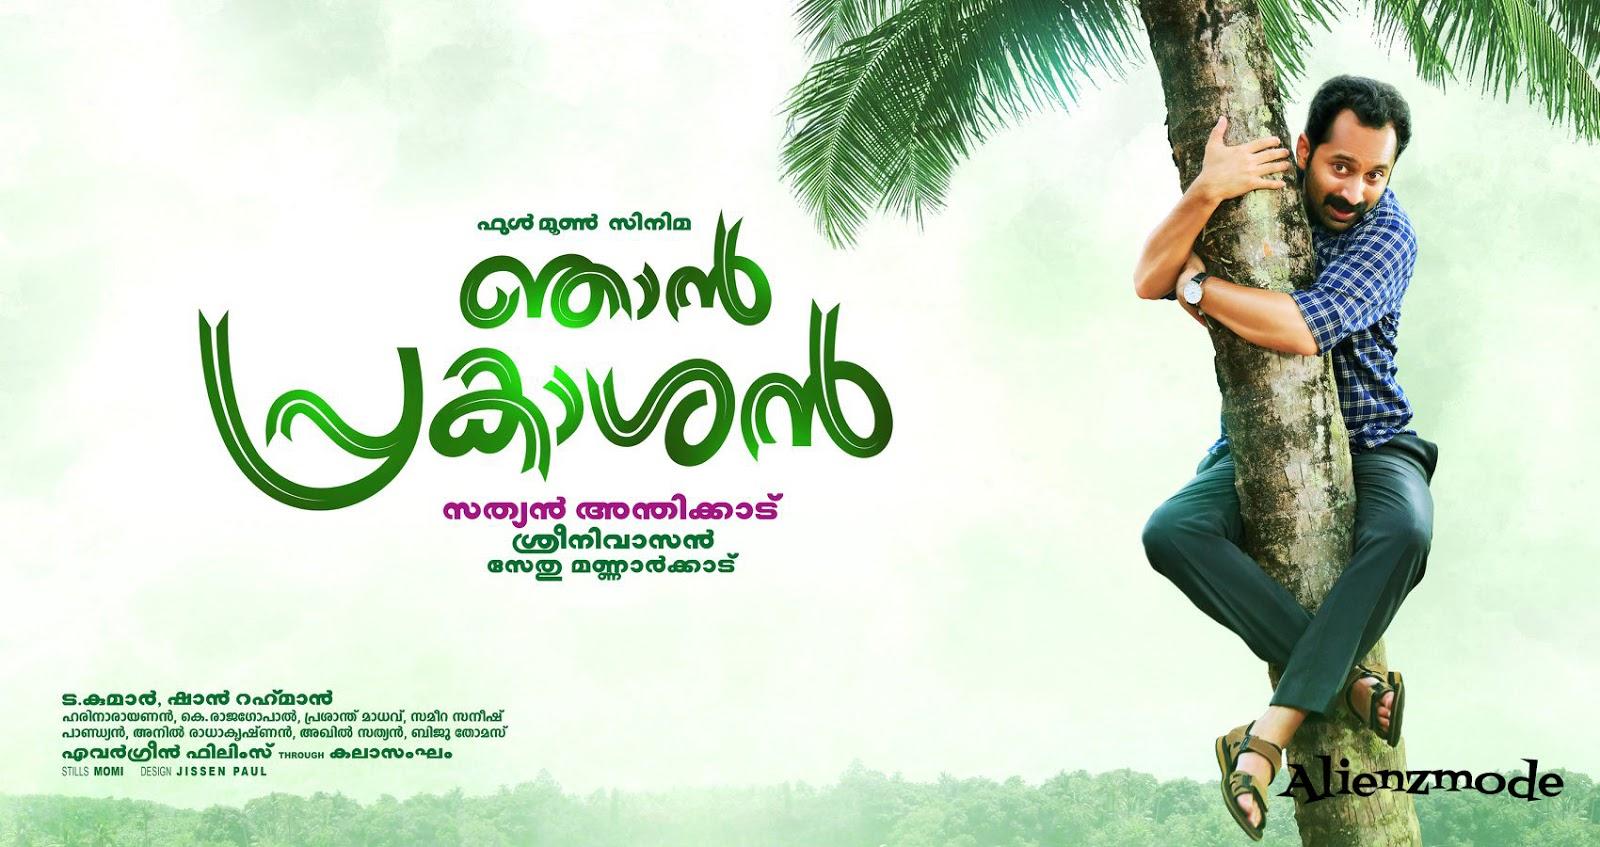 malayalam movies download sites name